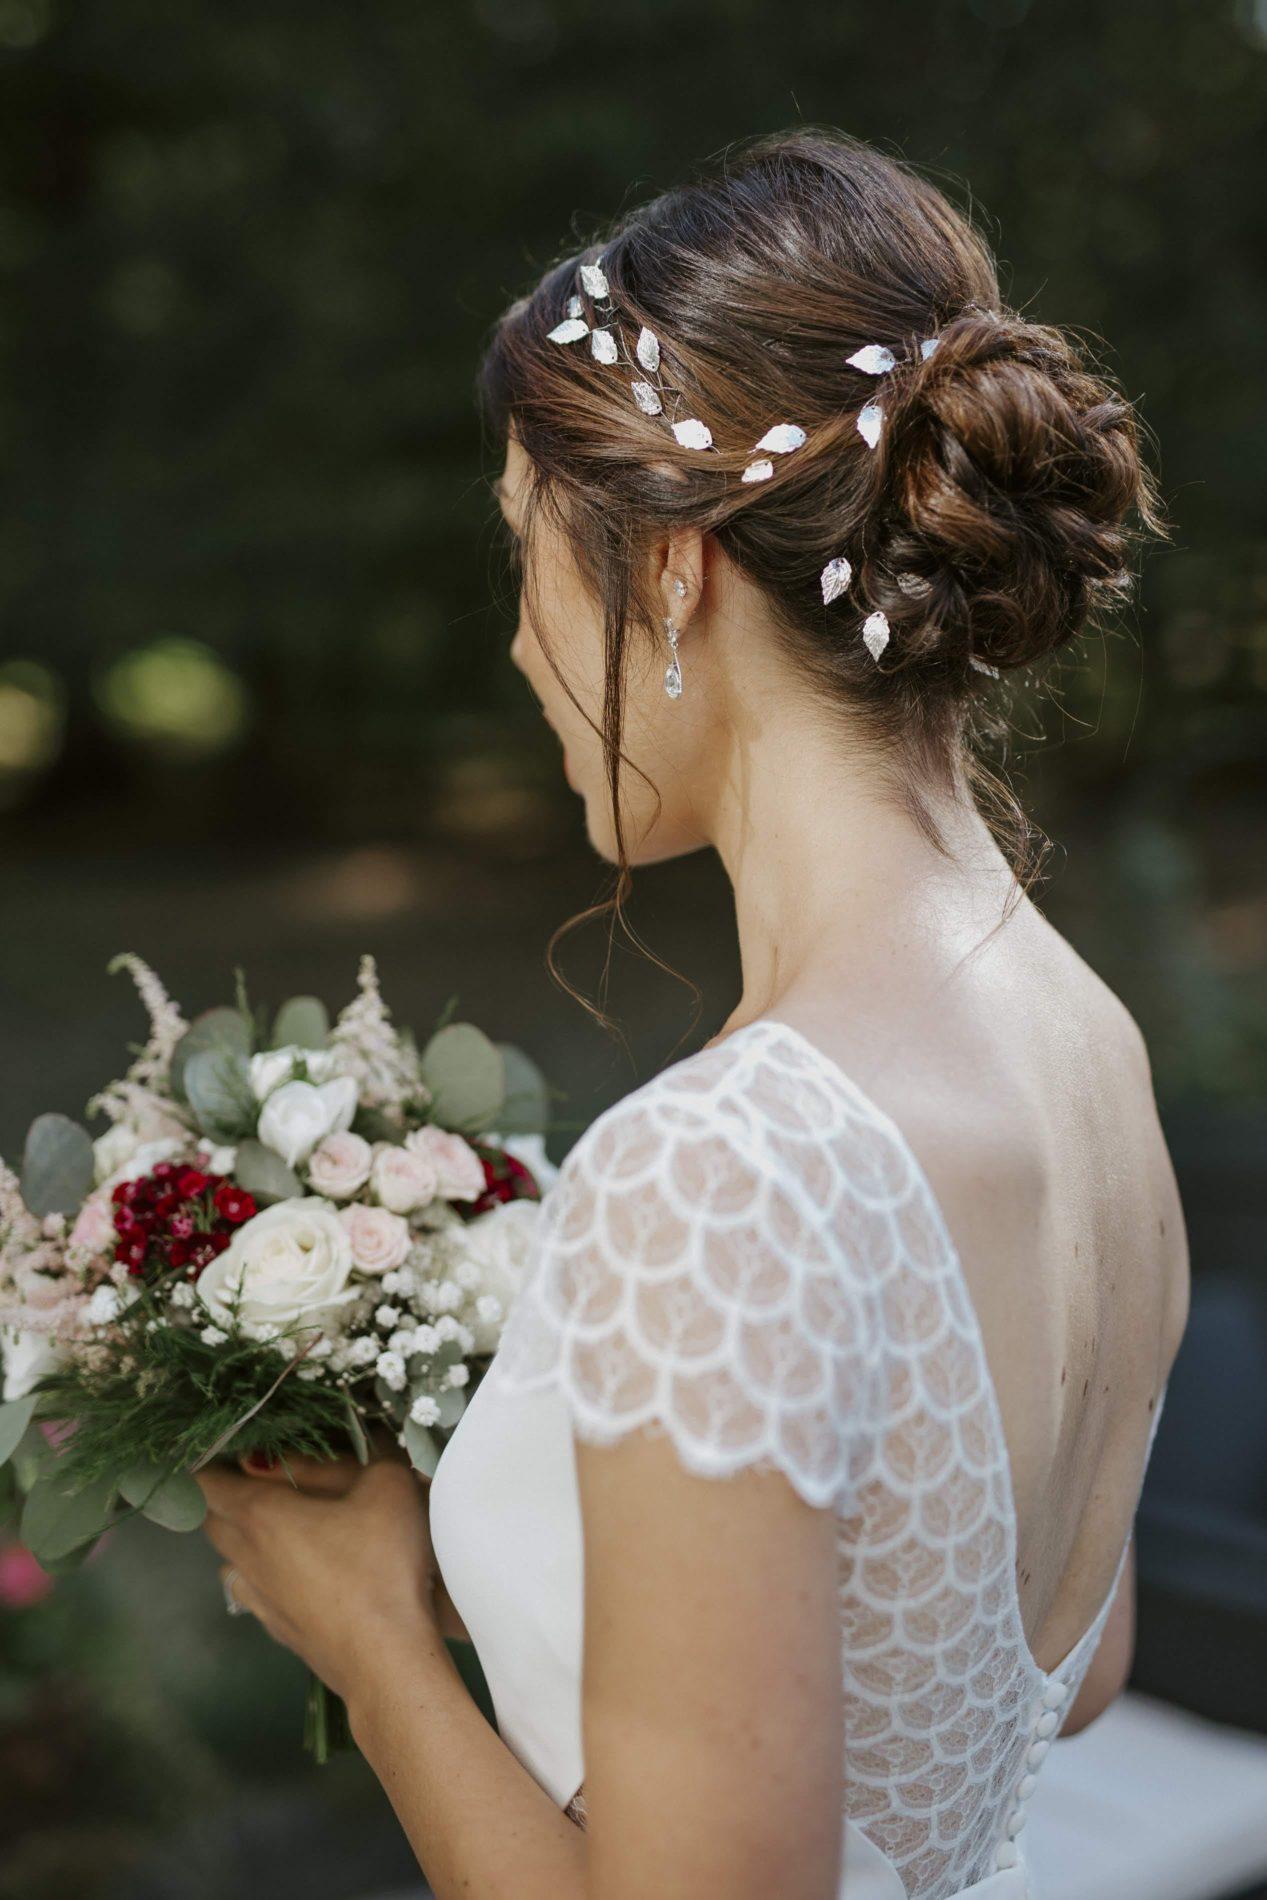 03-CelineSereivuth-82-obonheurdesdames-decoration-mariage-location-Jordane-Chaillou